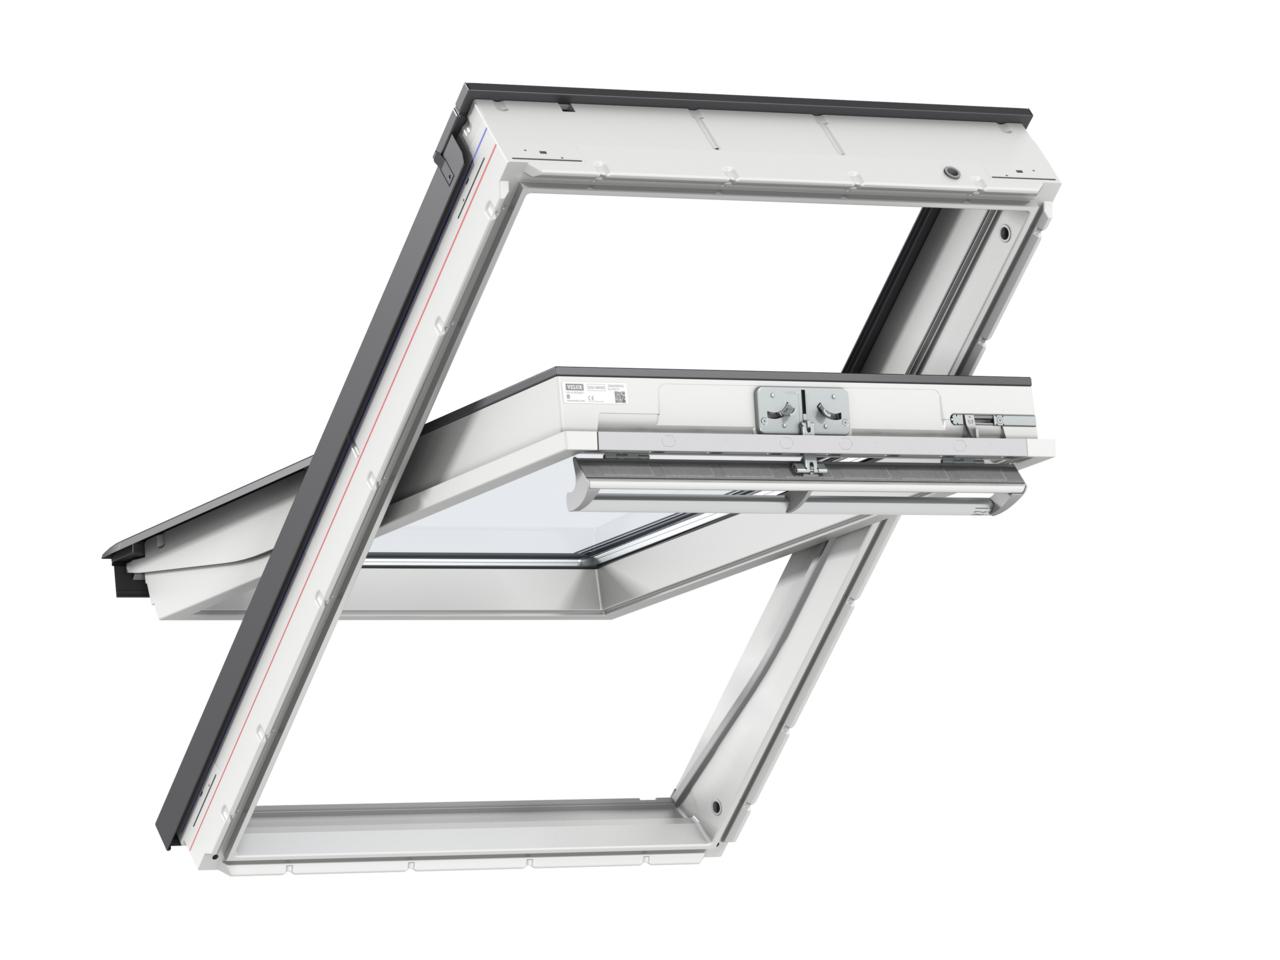 Velux GGU PK08 940 x 1400mm Centre Pivot 34Pane Roof Window - White Polyurethane